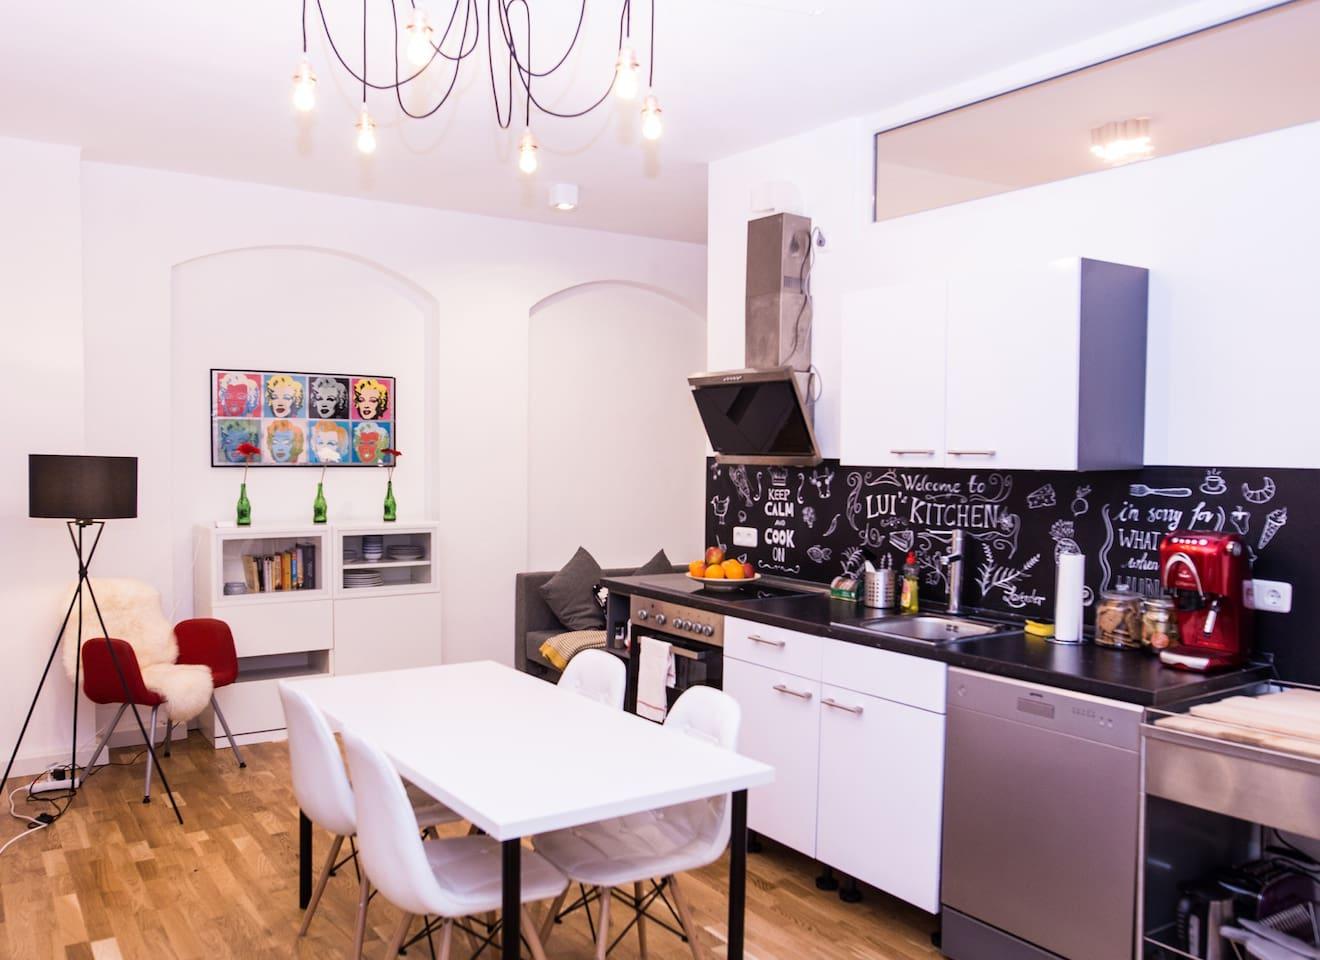 Open, artsy kitchen / Offene Wohnküche